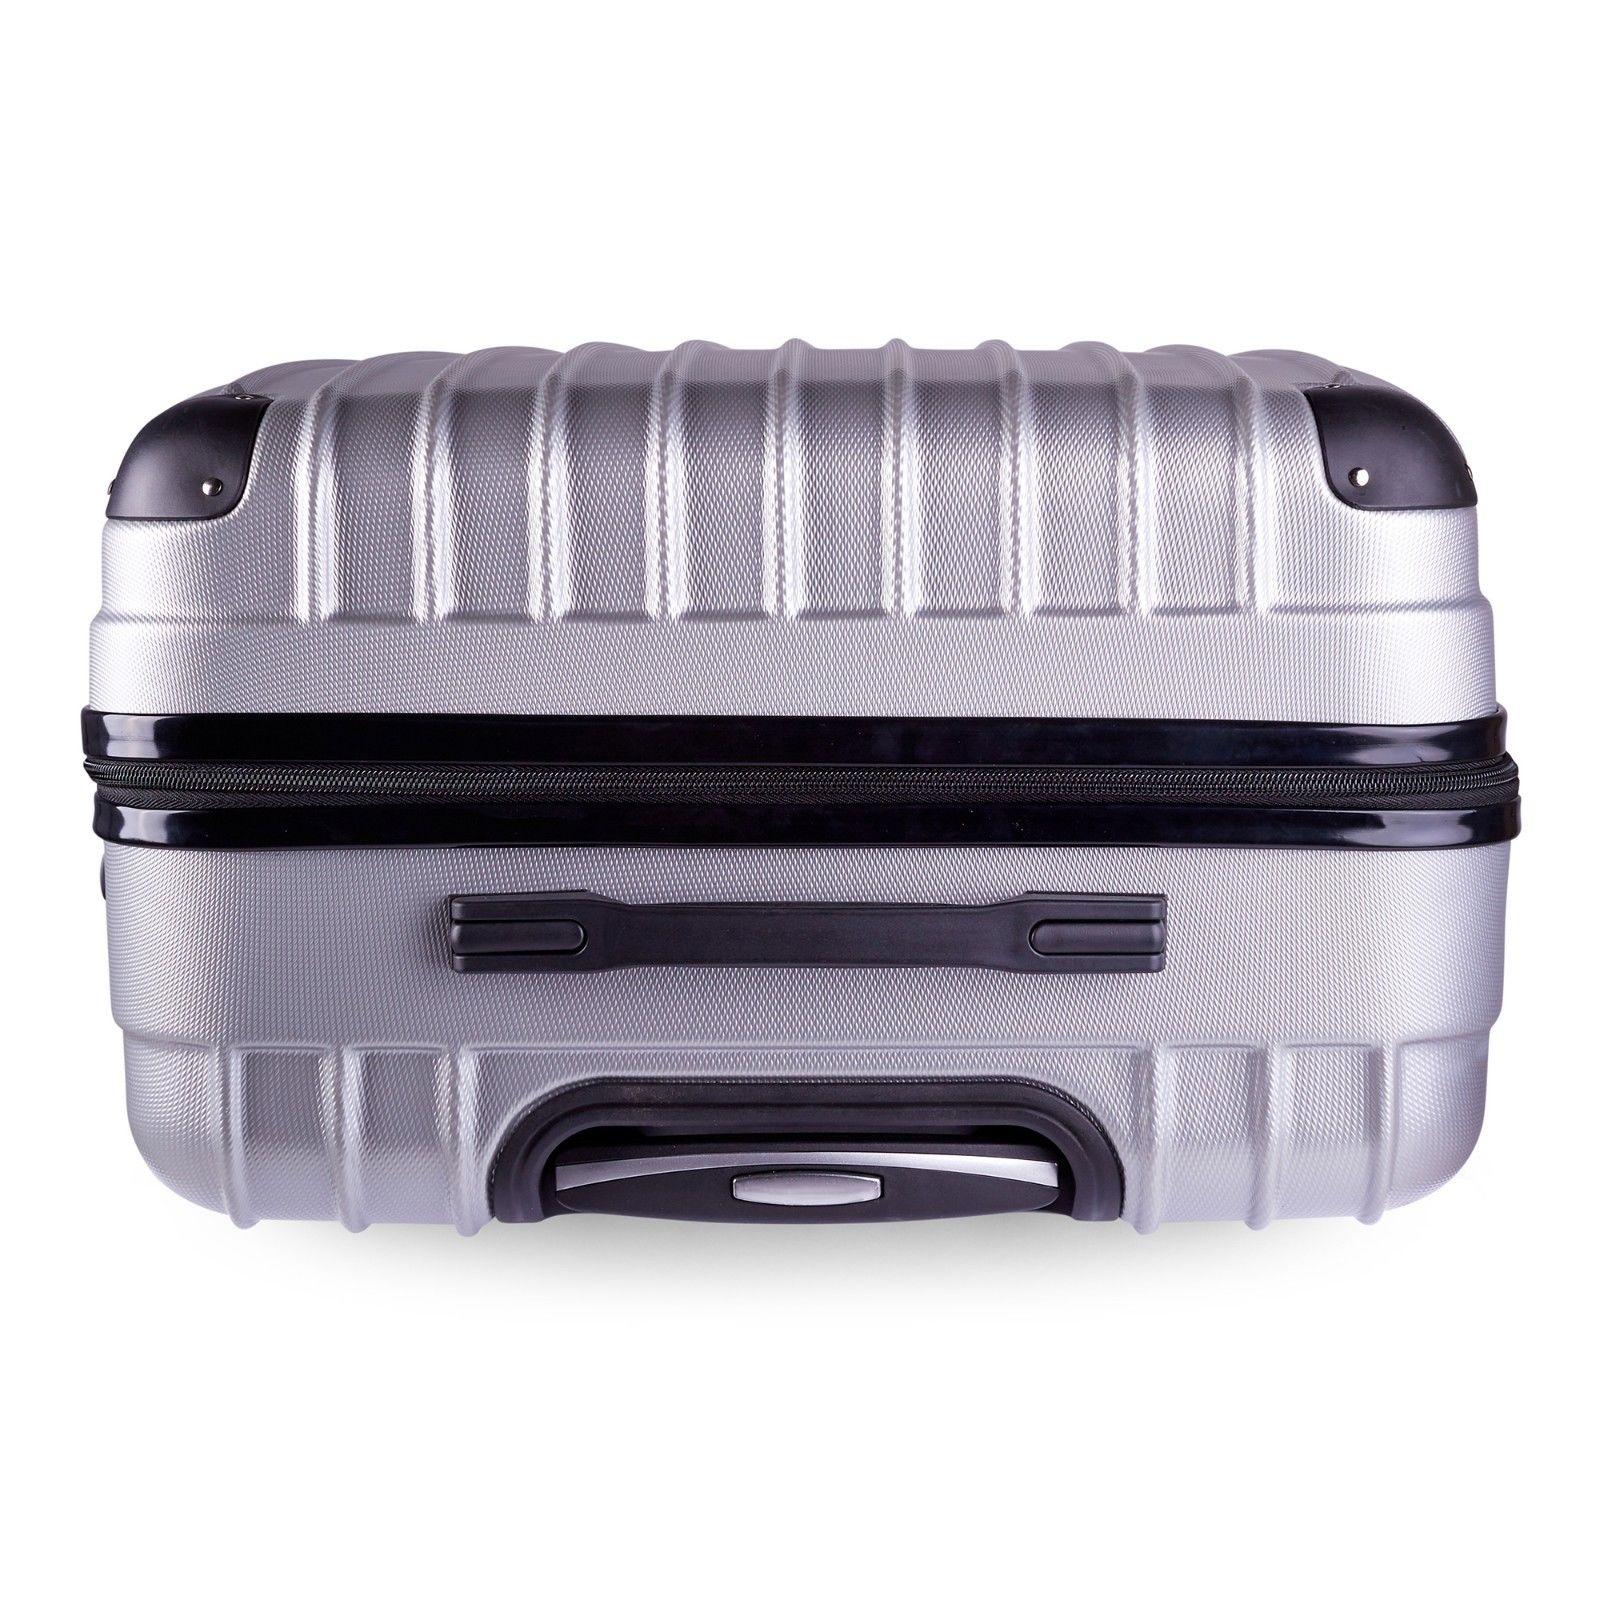 Milano-Premium-3pc-ABS-Luggage-Suitcase-Luxury-Hard-Case-Shockproof-Travel-Set thumbnail 35